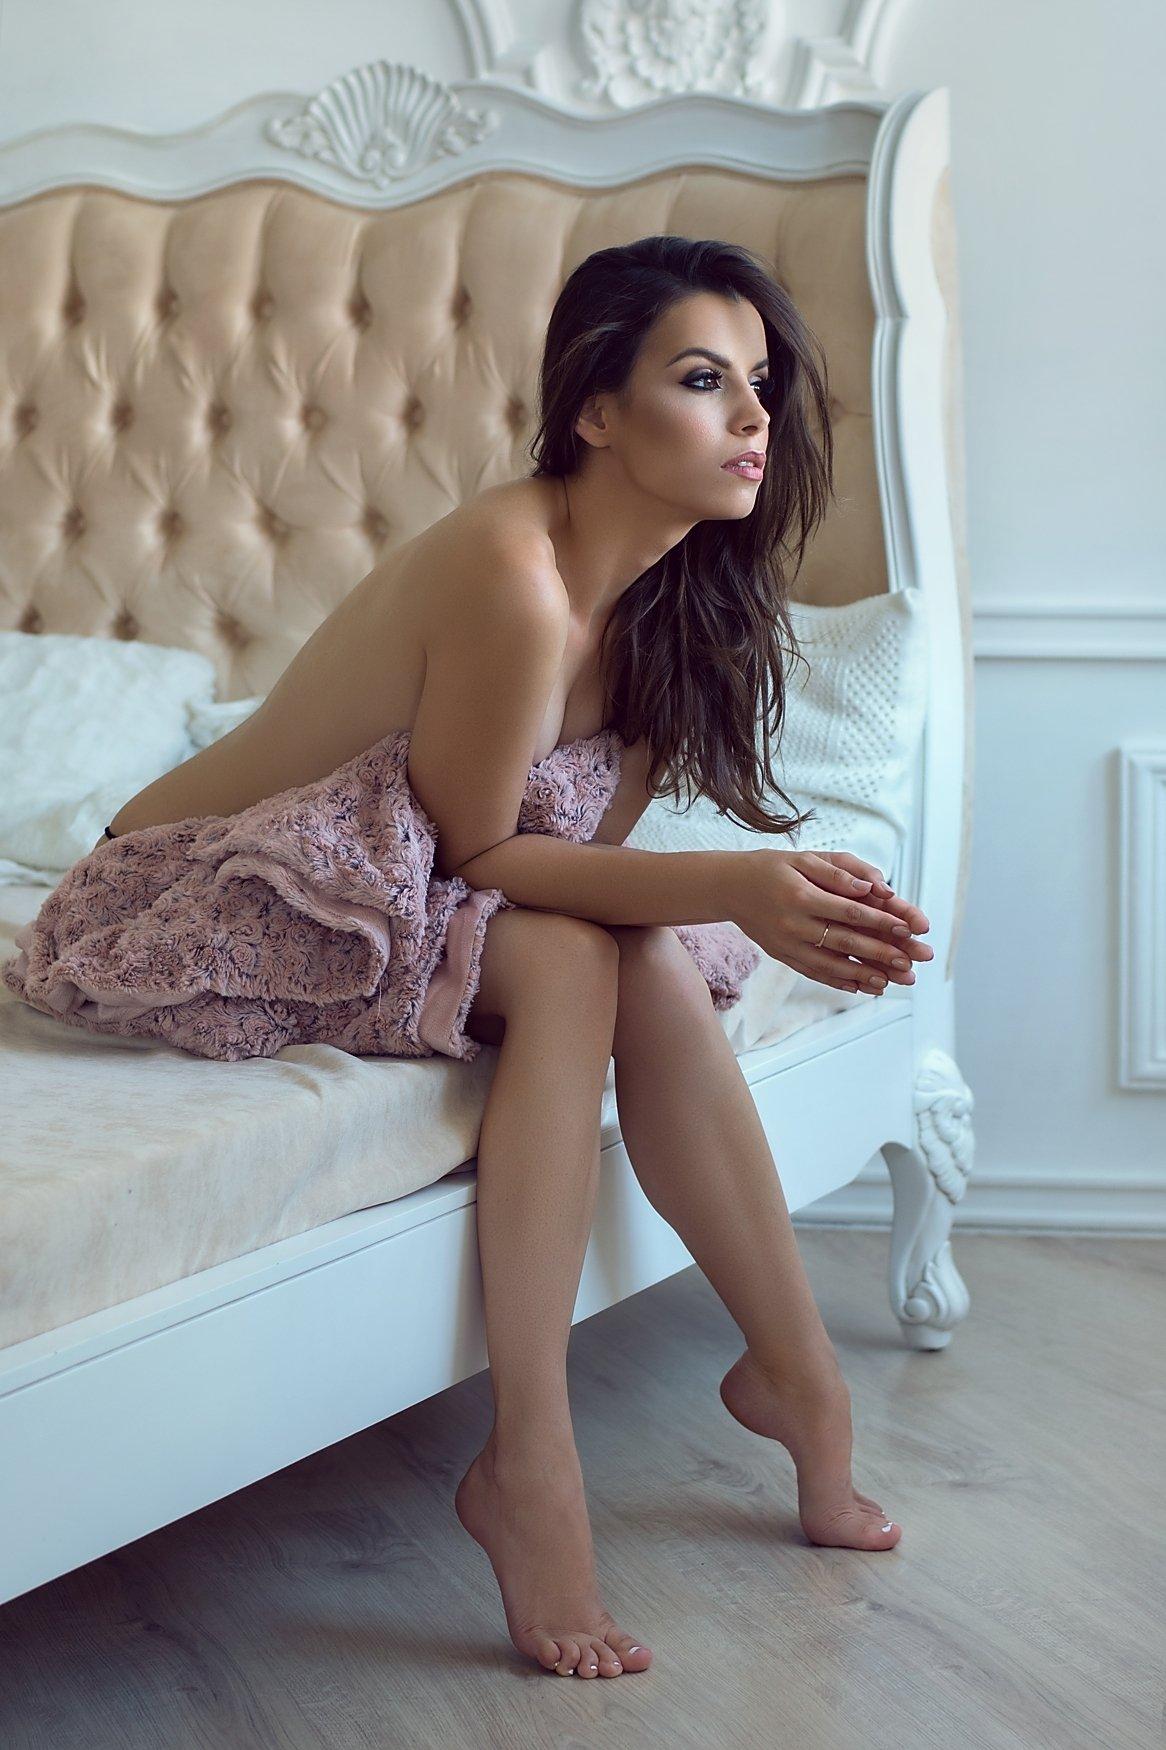 model, glamour, woman, female, colour, body, sexy, sensual,  curves, portrait, erotica,  fine art, implied nude, hair, fashion, fashion nude, portrait, bedroom, natural light, legs,, Lajos Csáki